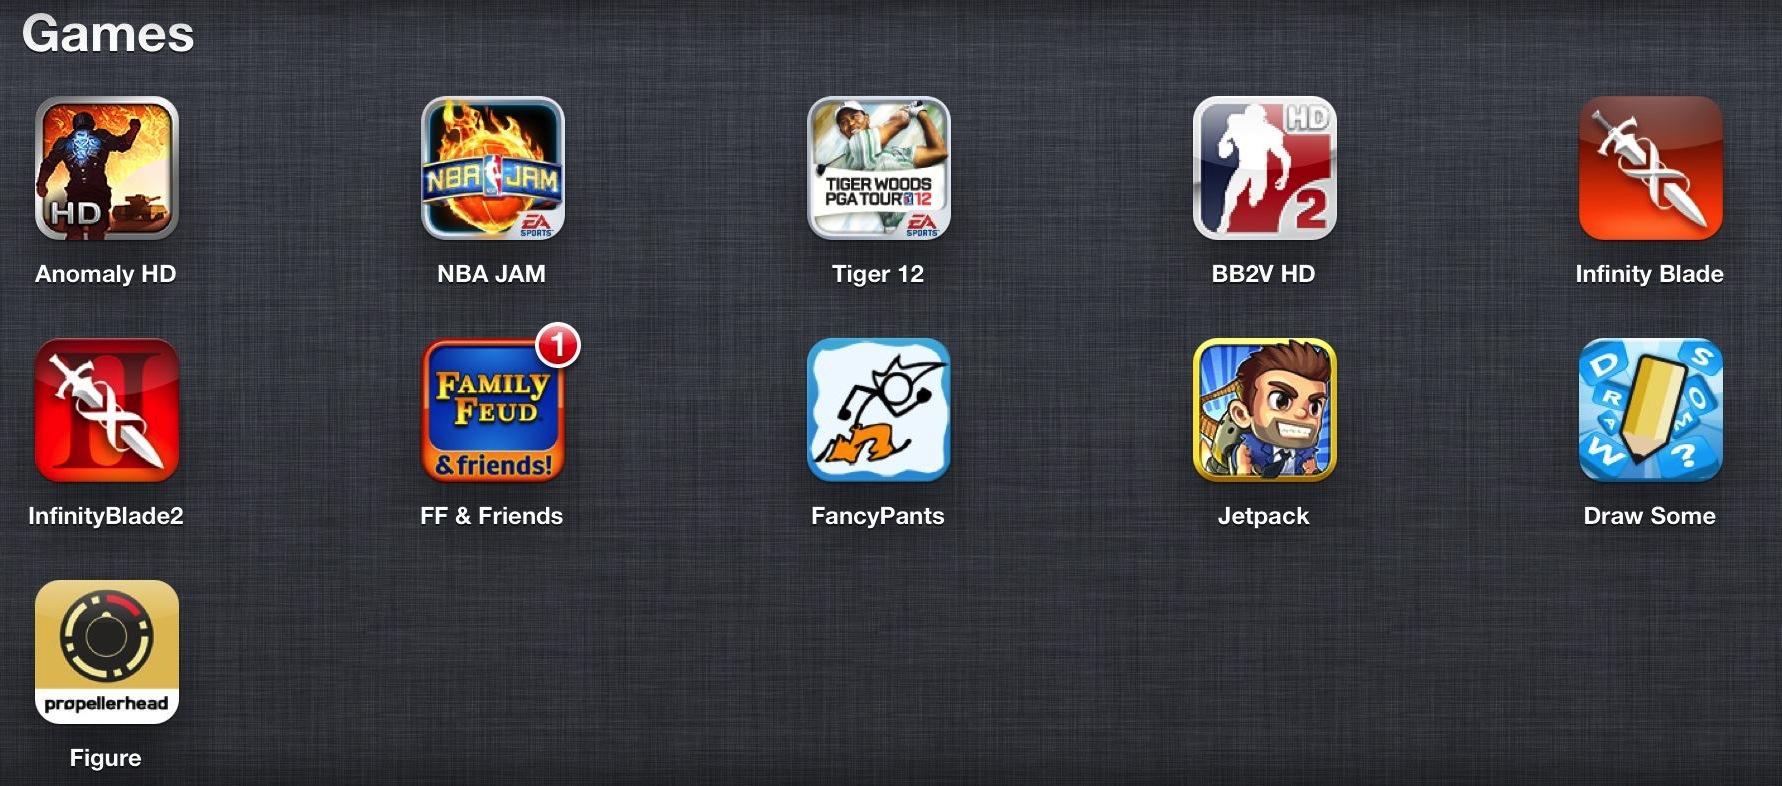 43 Fun and Addictive iPad Games (Video)